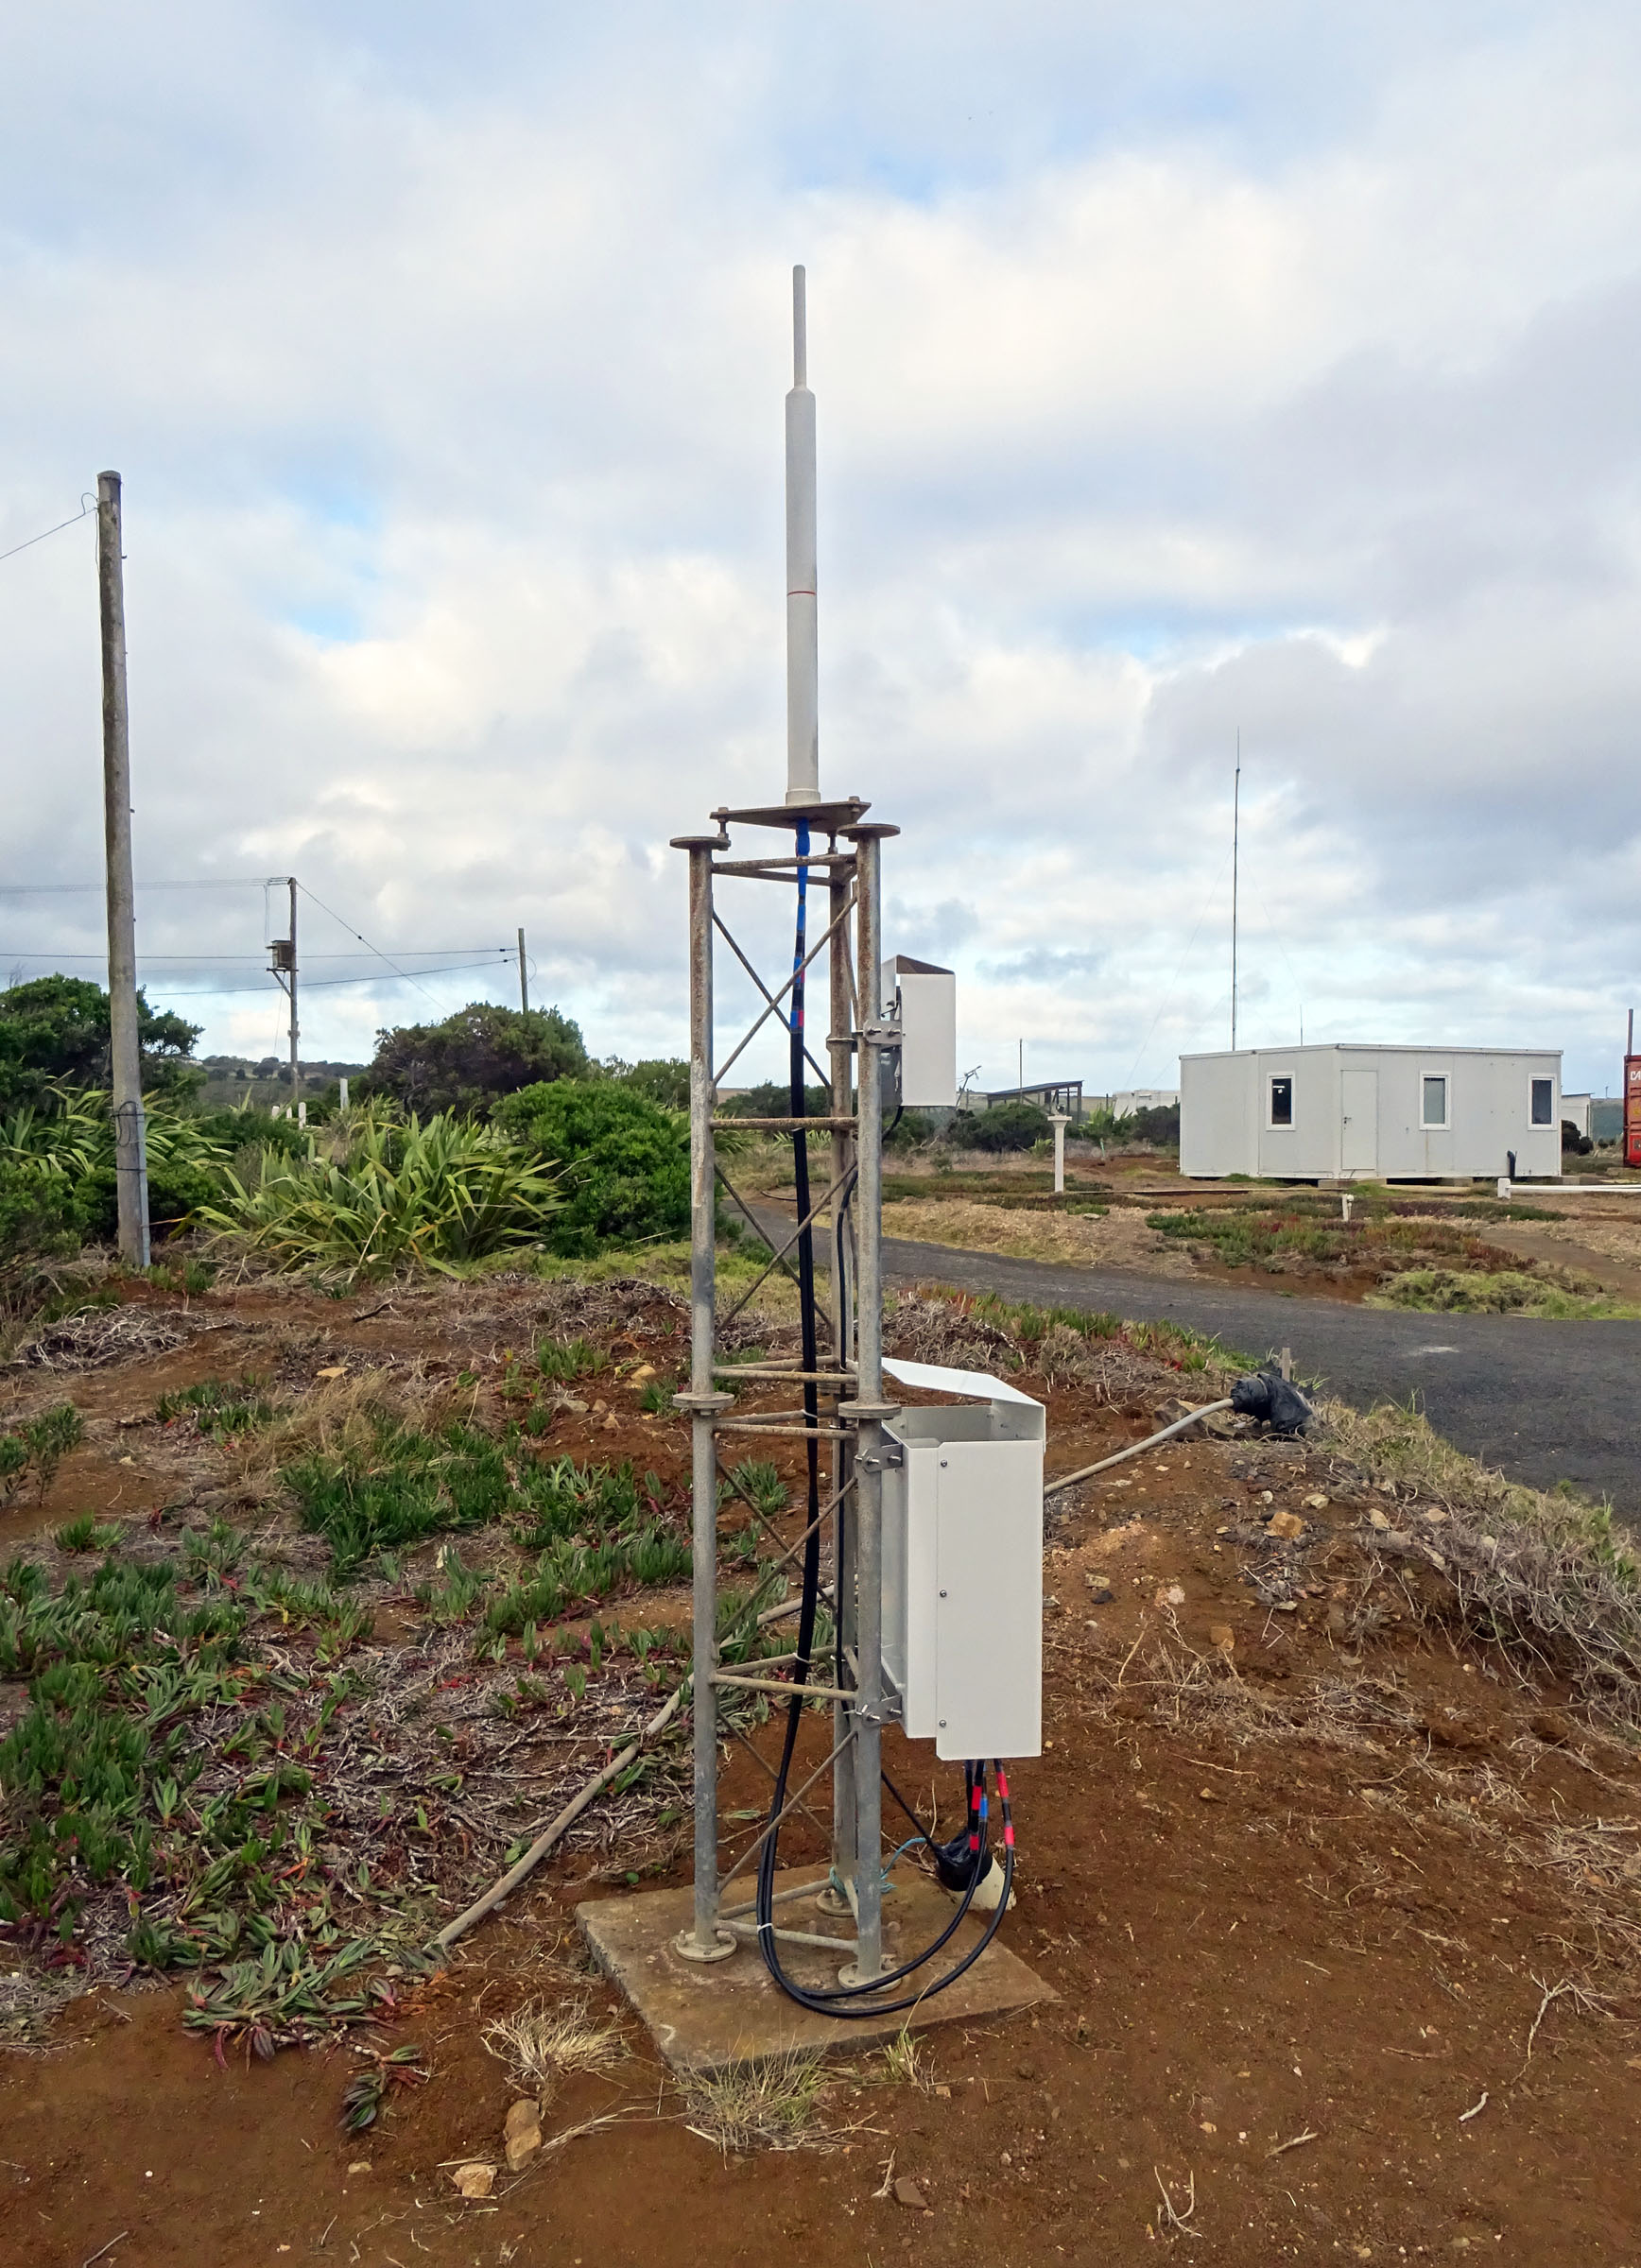 DORIS station: ST-HELENA - UNITED KINGDOM (South Atlantic Ocean)